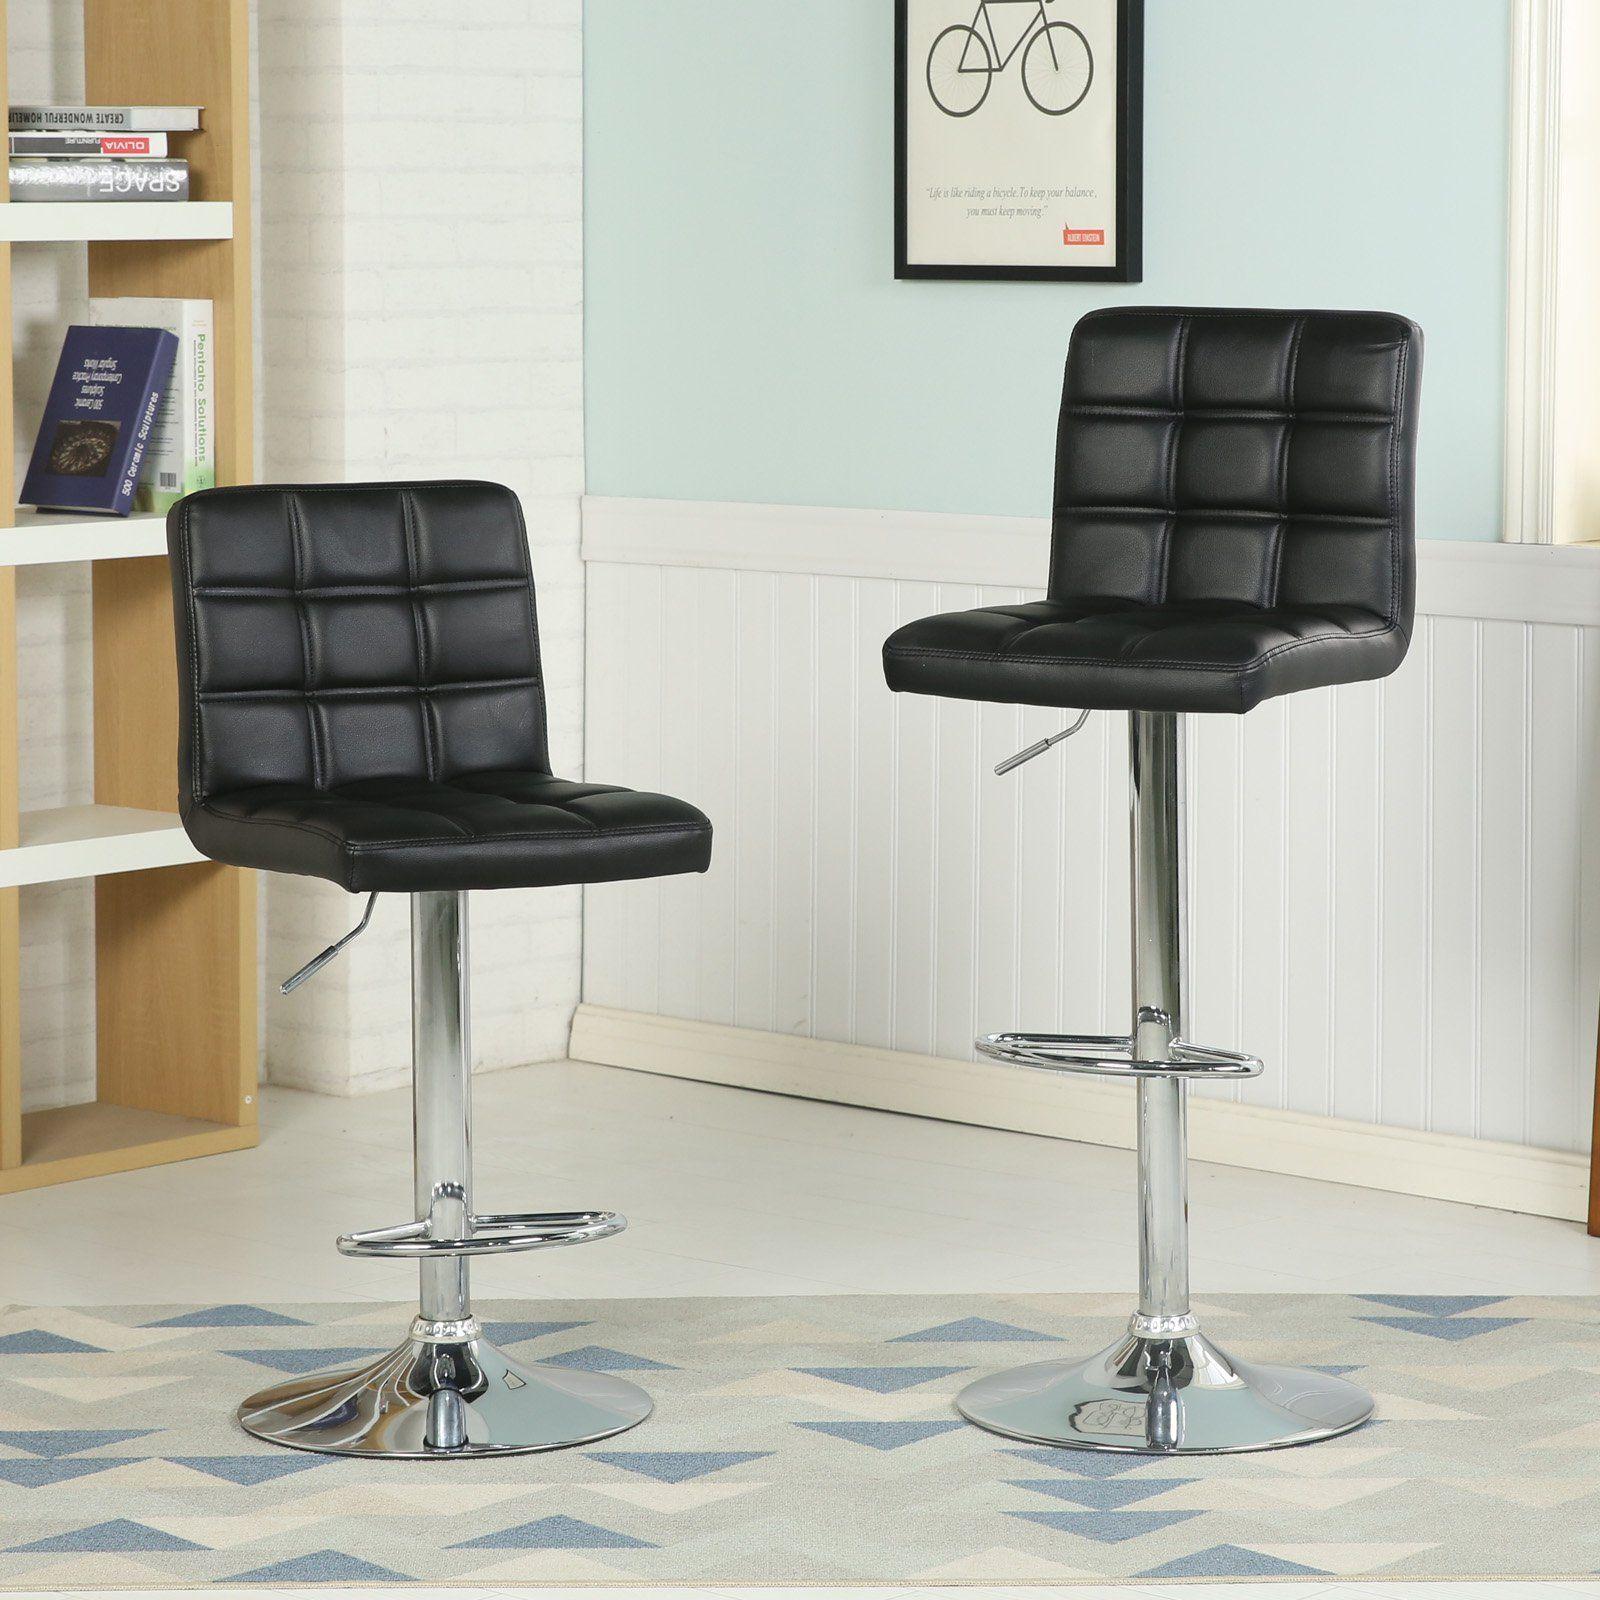 Strange Roundhill Furniture Bordeau Adjustable Bar Stool Set Of 2 Theyellowbook Wood Chair Design Ideas Theyellowbookinfo